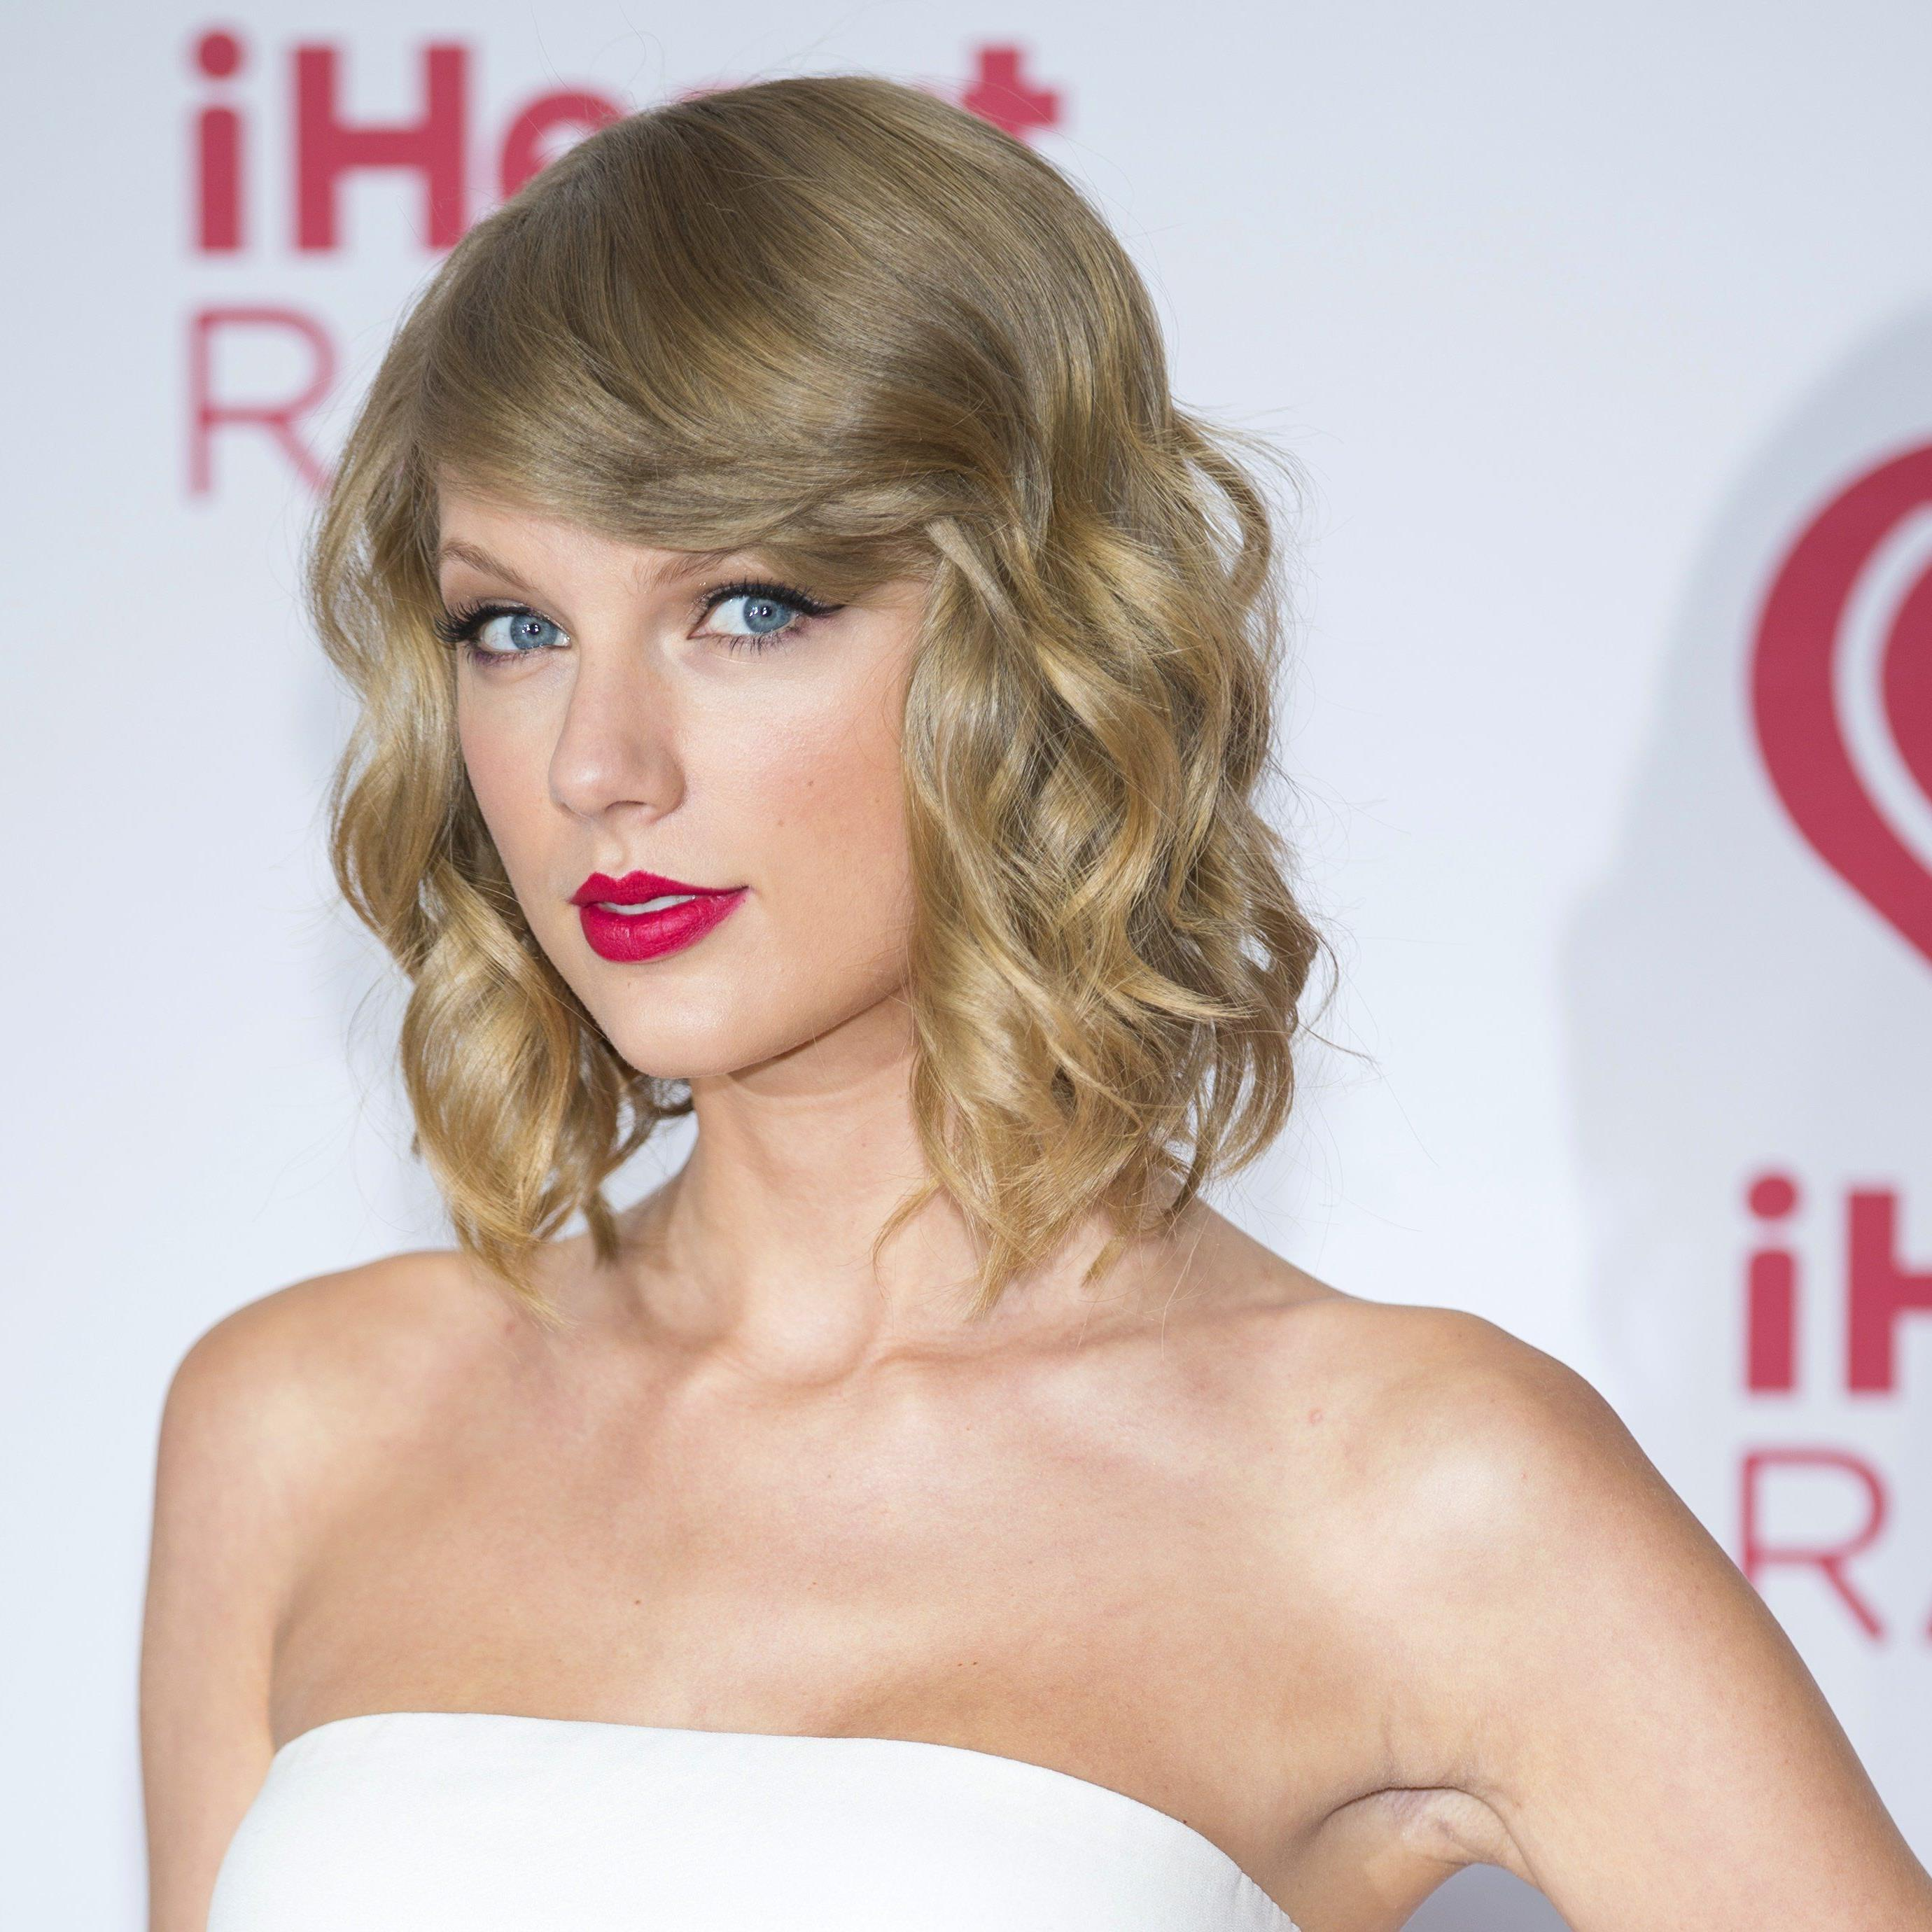 Streaming-Dienst bedauert Sperre aller Alben des US-Popstars